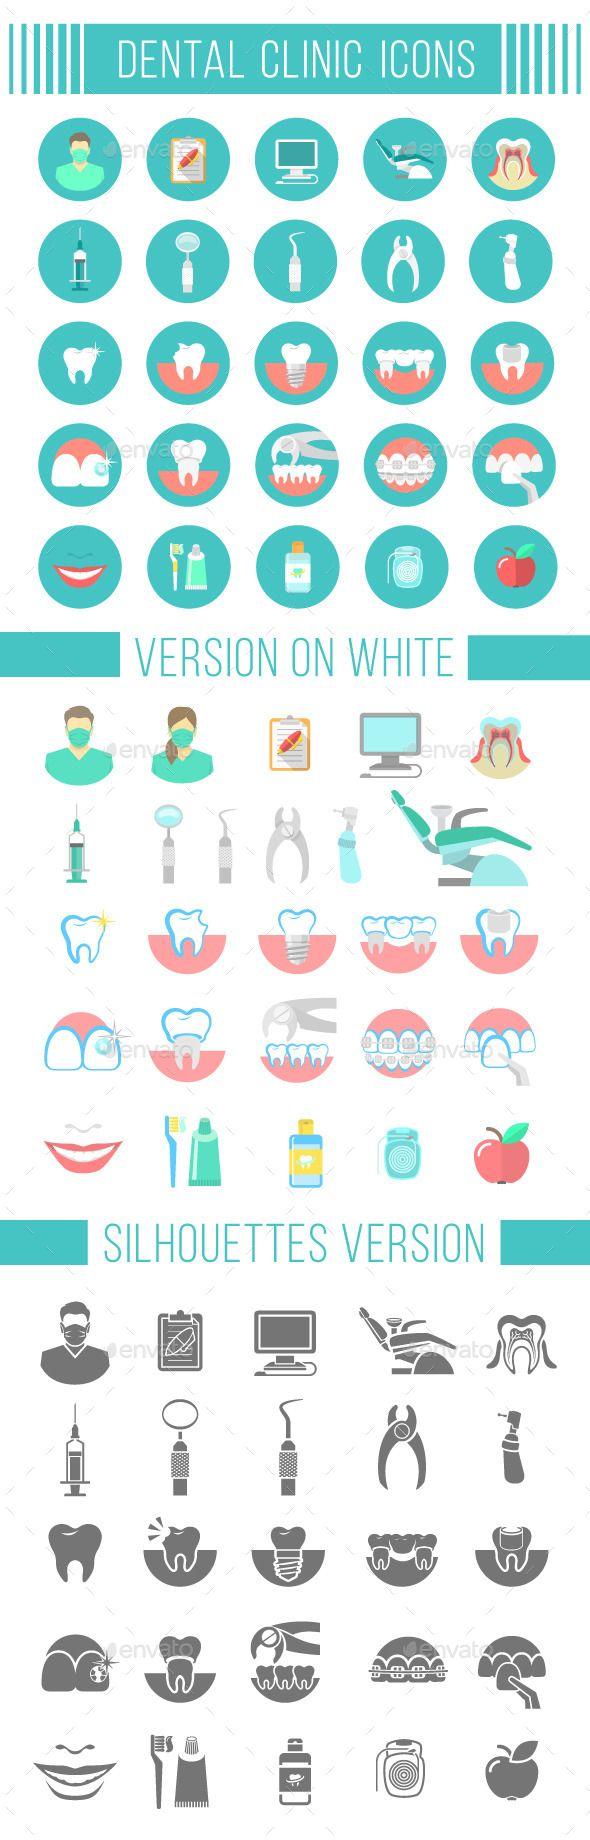 Dental Clinic Services Flat Icons - Miscellaneous Icons iconos dentales que nos ayudan a explicar a nuestros pacientes www.clinicadentalmagallanes.com